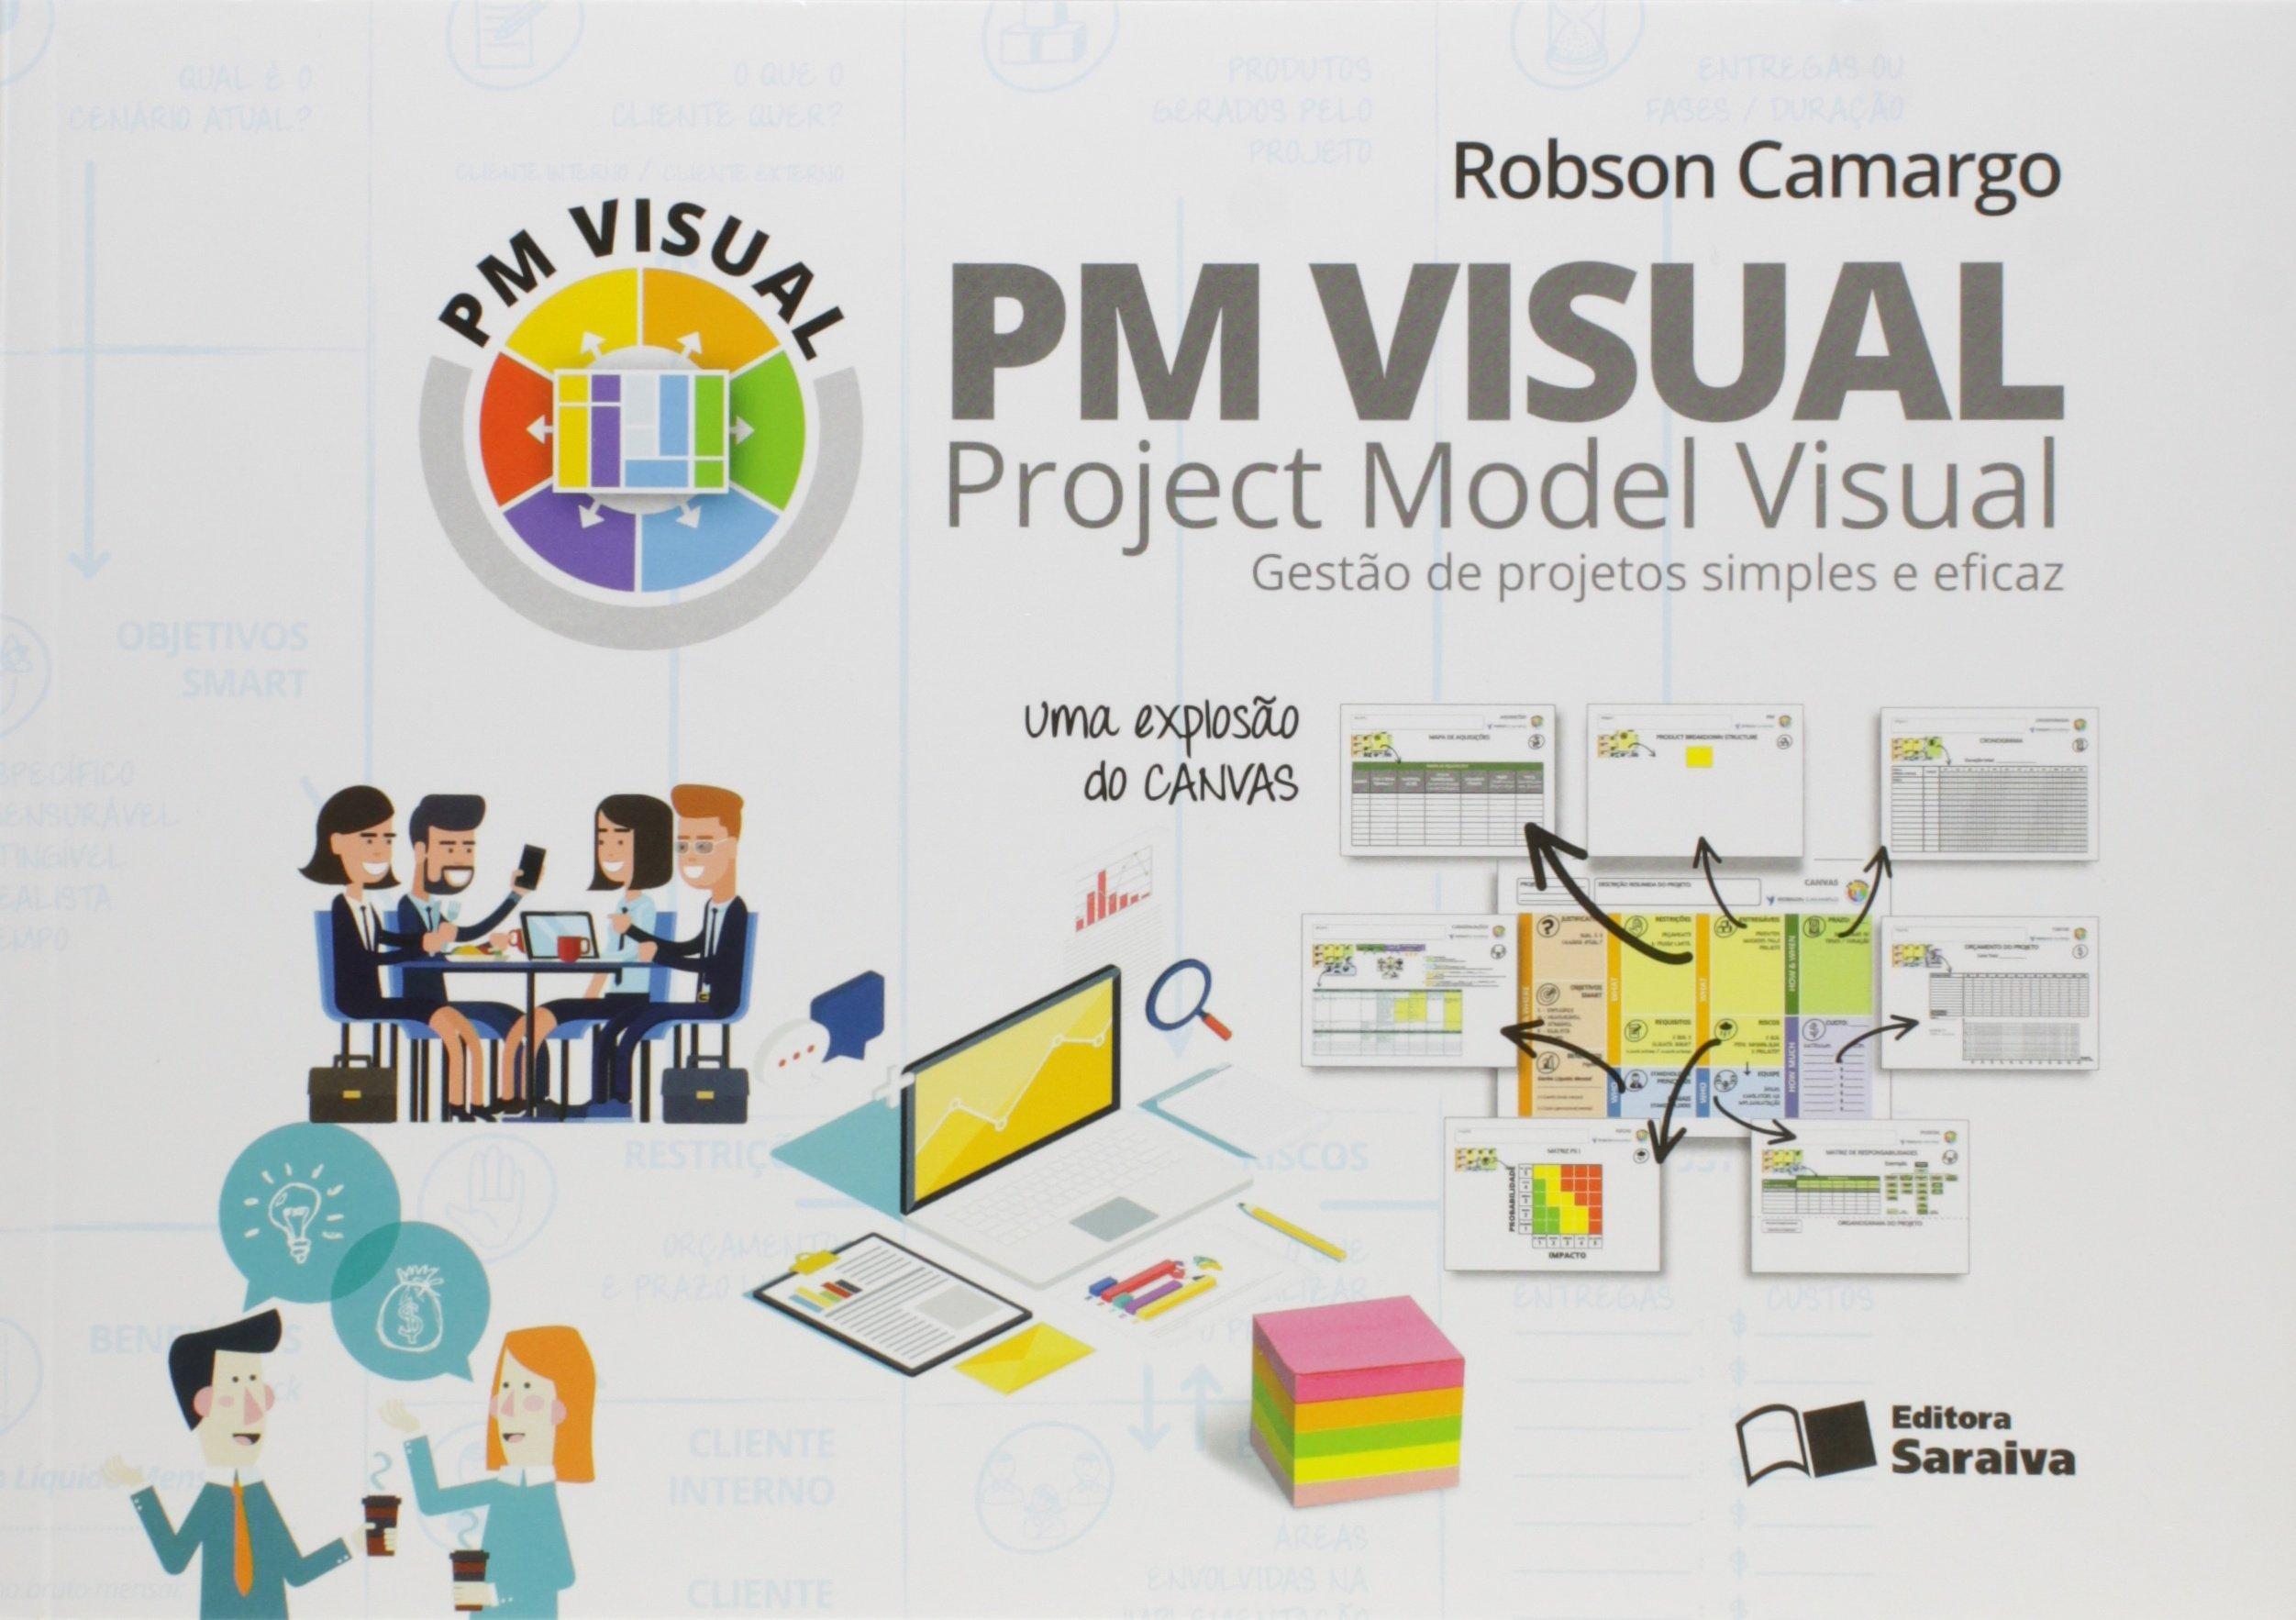 pm visual